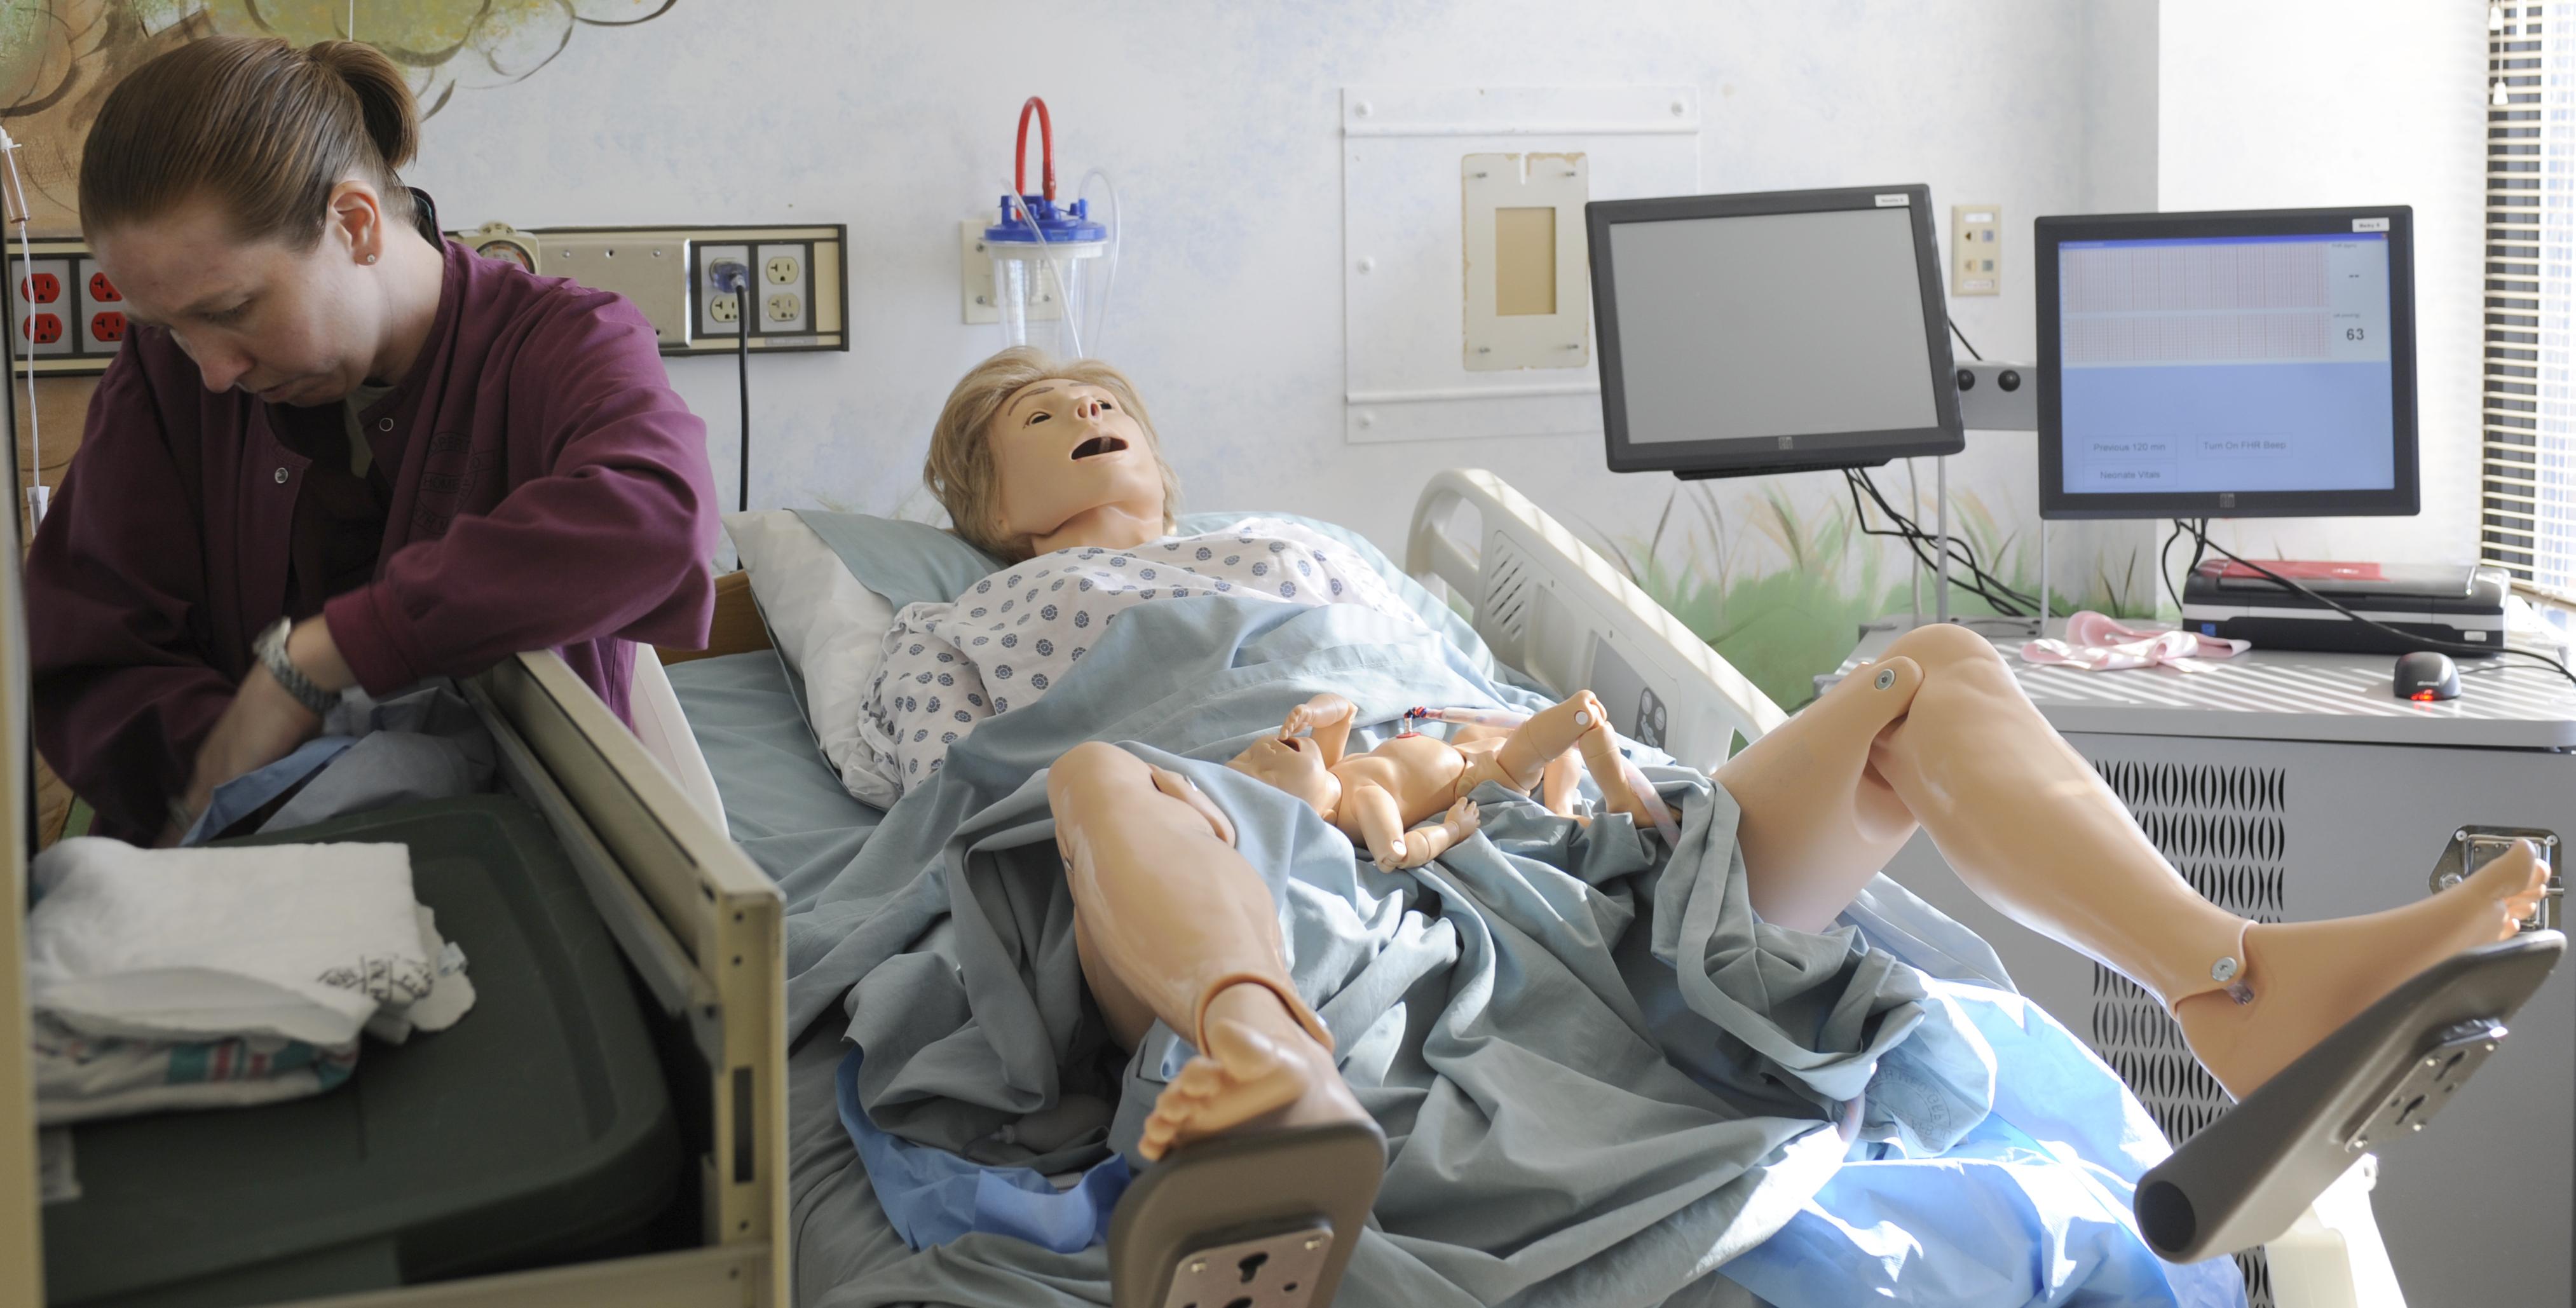 Simulator prepares medical staff for obstetric emergencies > U S